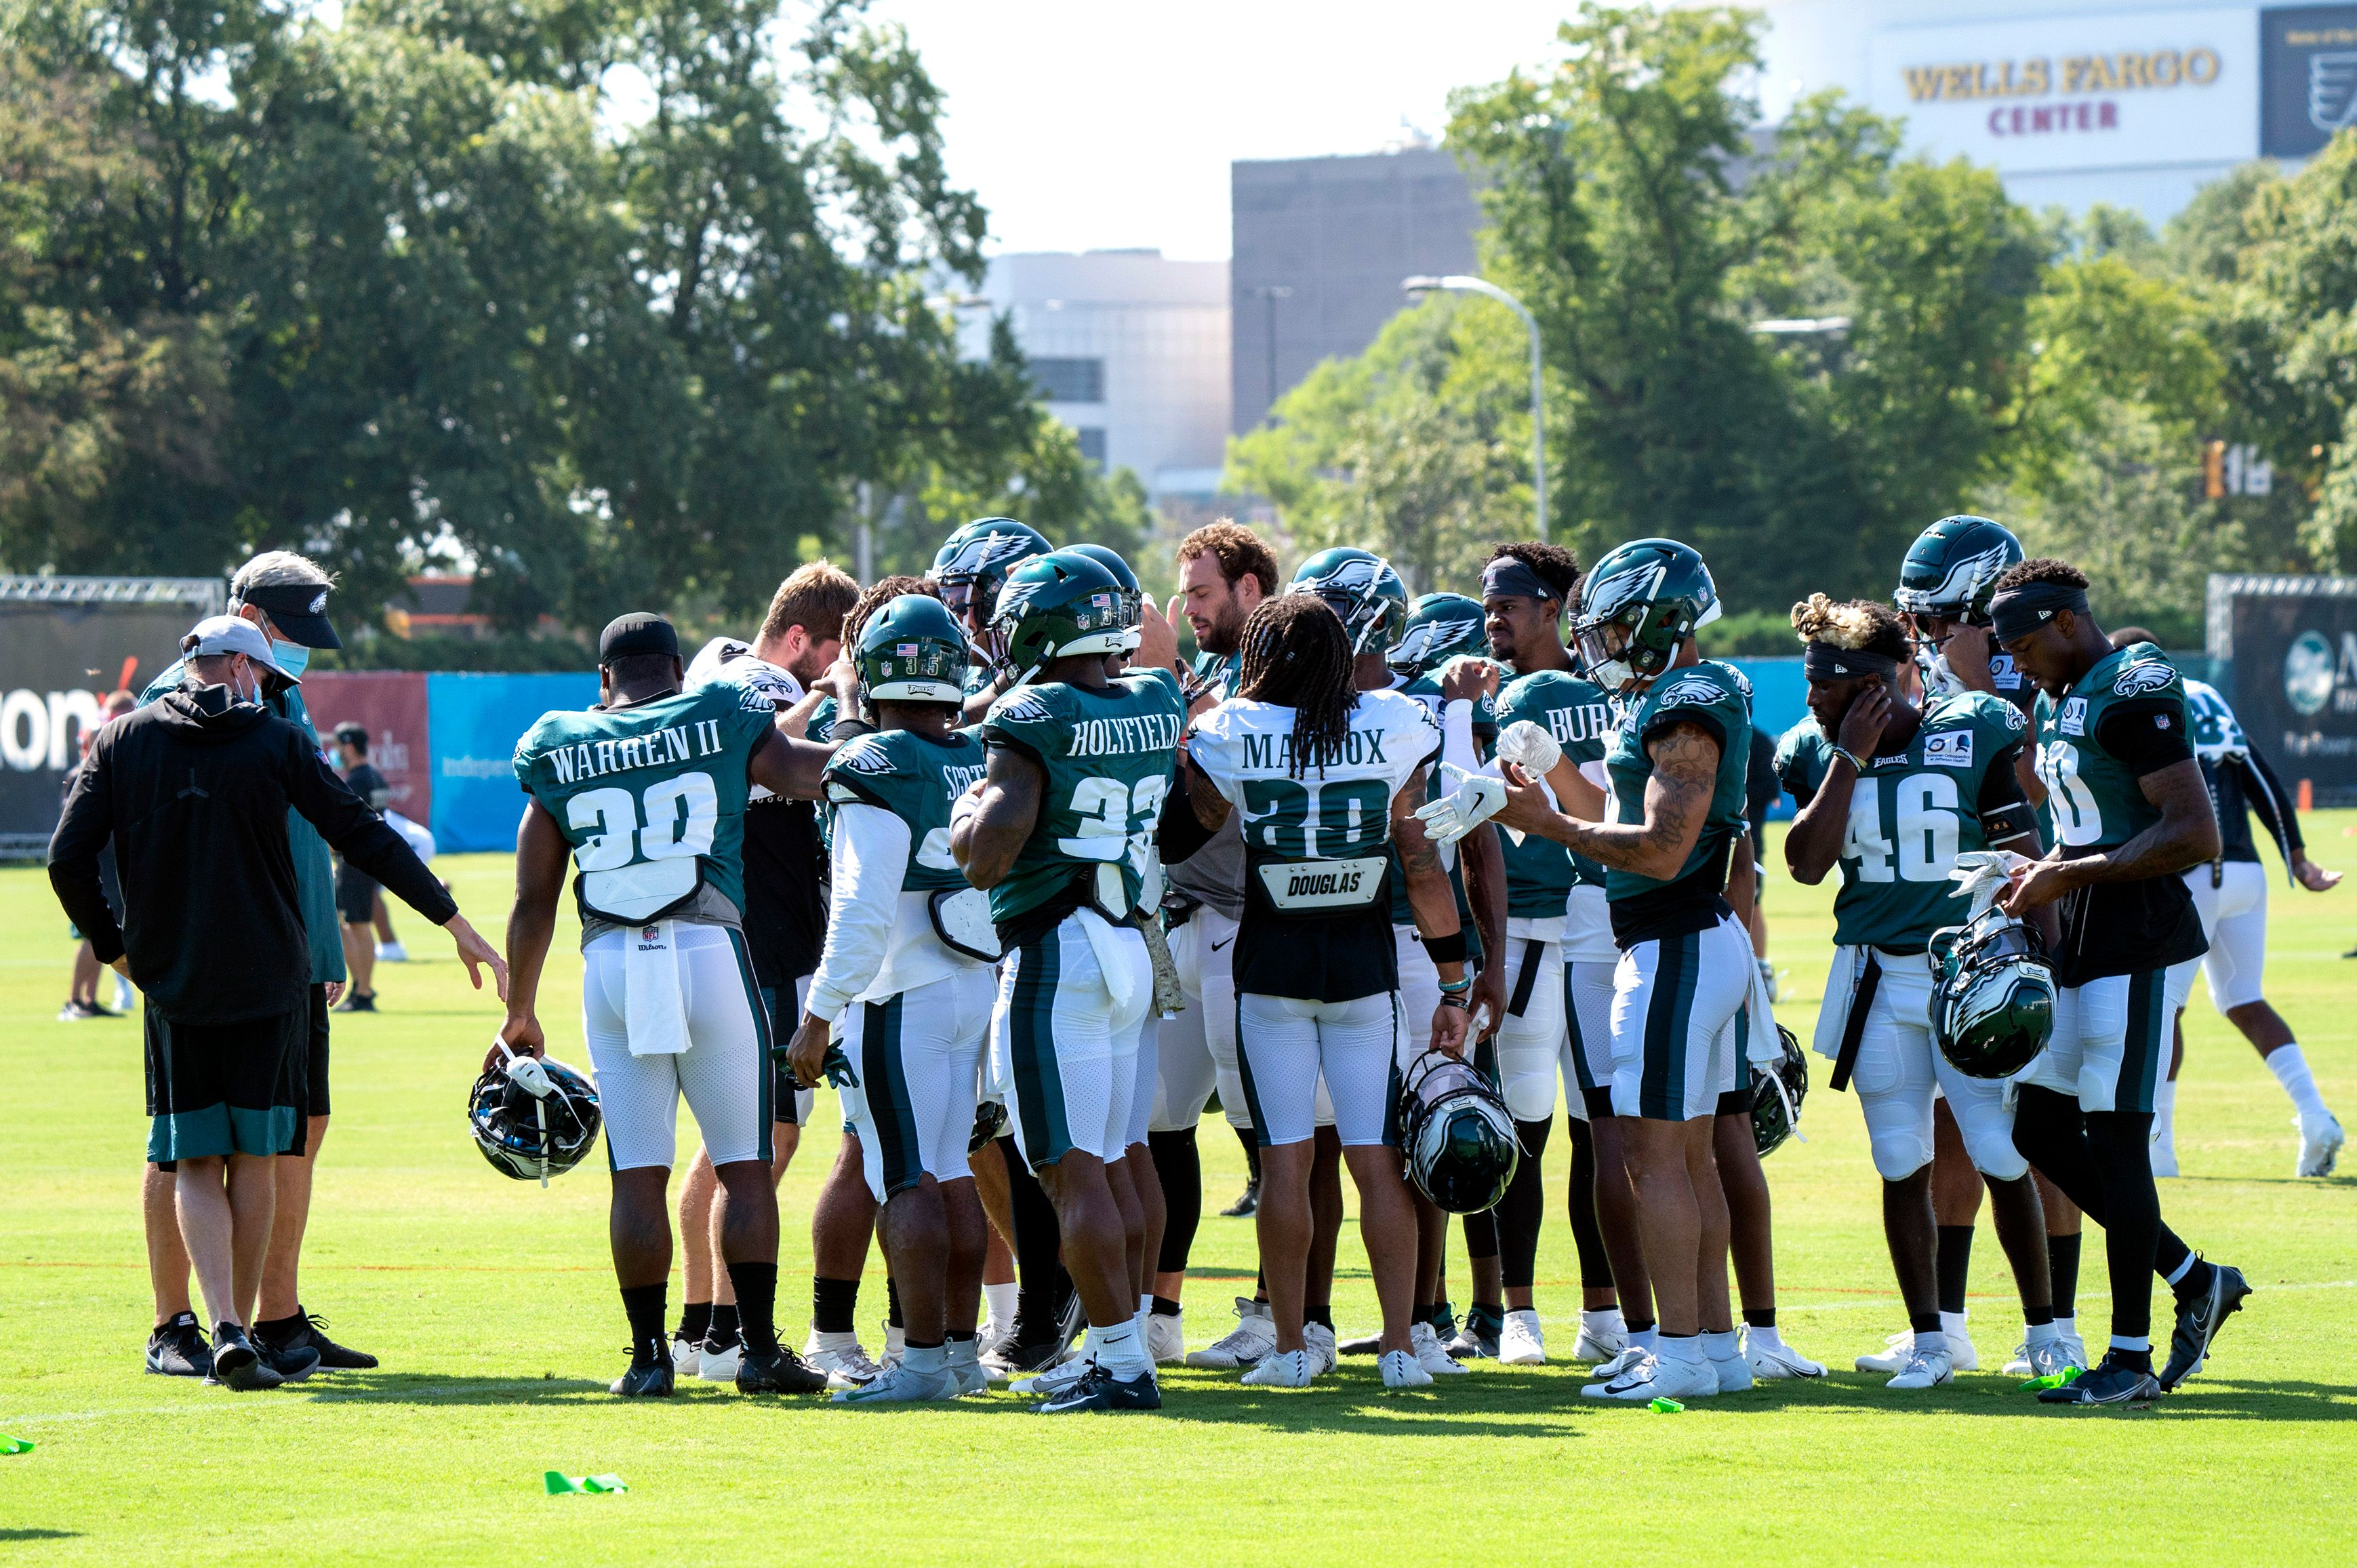 Members of the Philadelphia Eagles at practice.